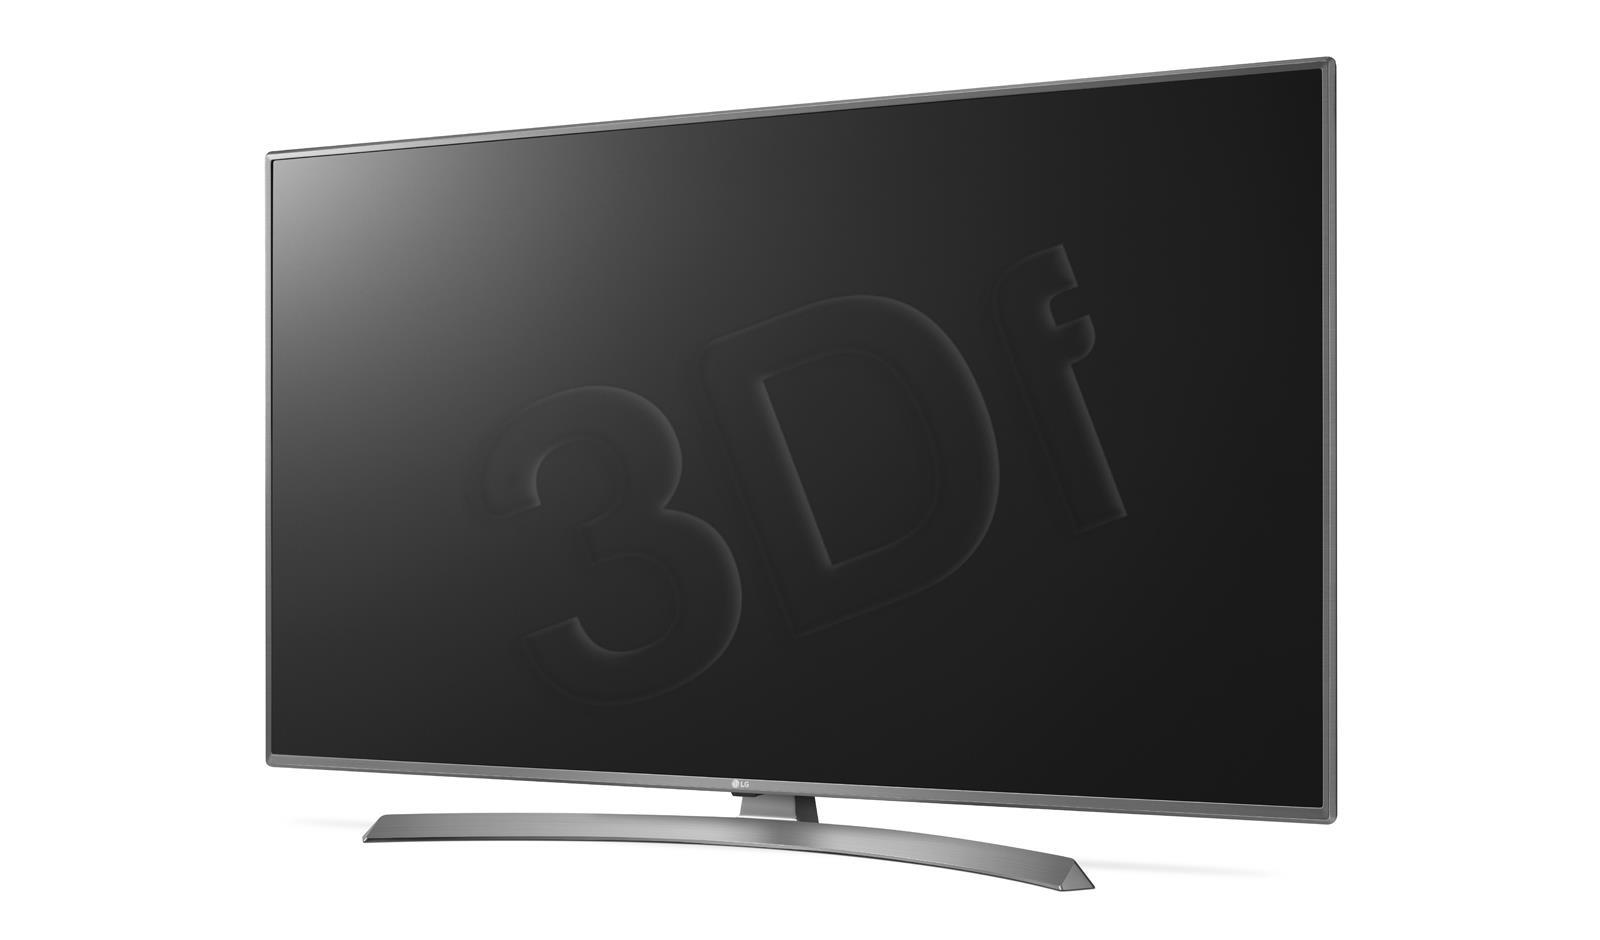 LG 65UV341C ( 4K 3840x2160 DVB-C DVB-S2 DVB-T2 3 1 SmartTV WiFi